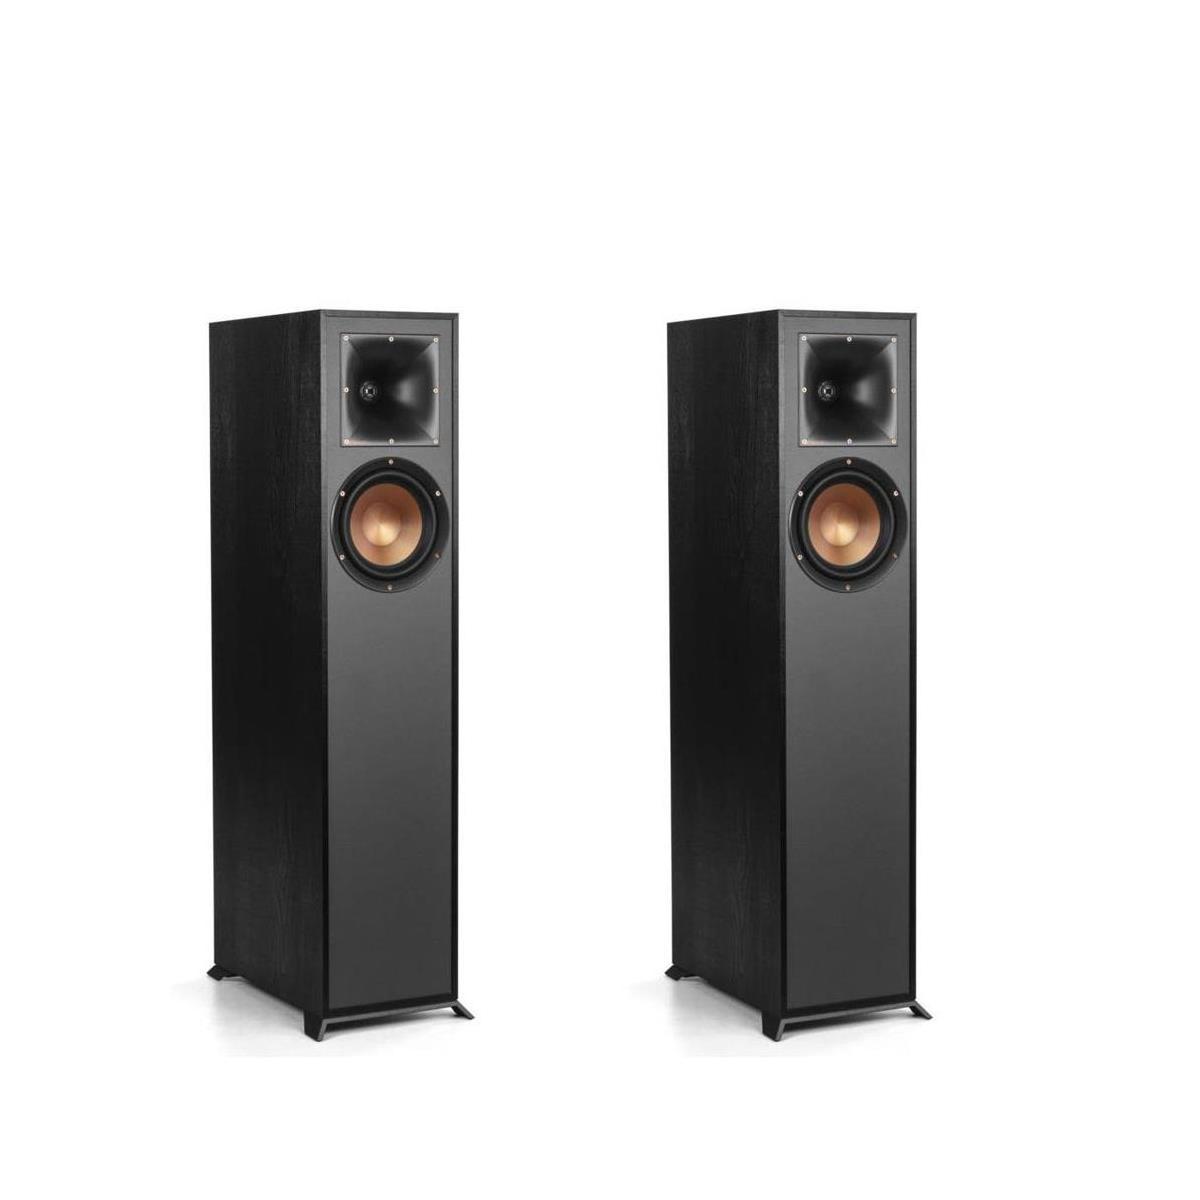 Klipsch R-610F Floorstanding Speakers (Pair) $229 + free s/h at Adorama